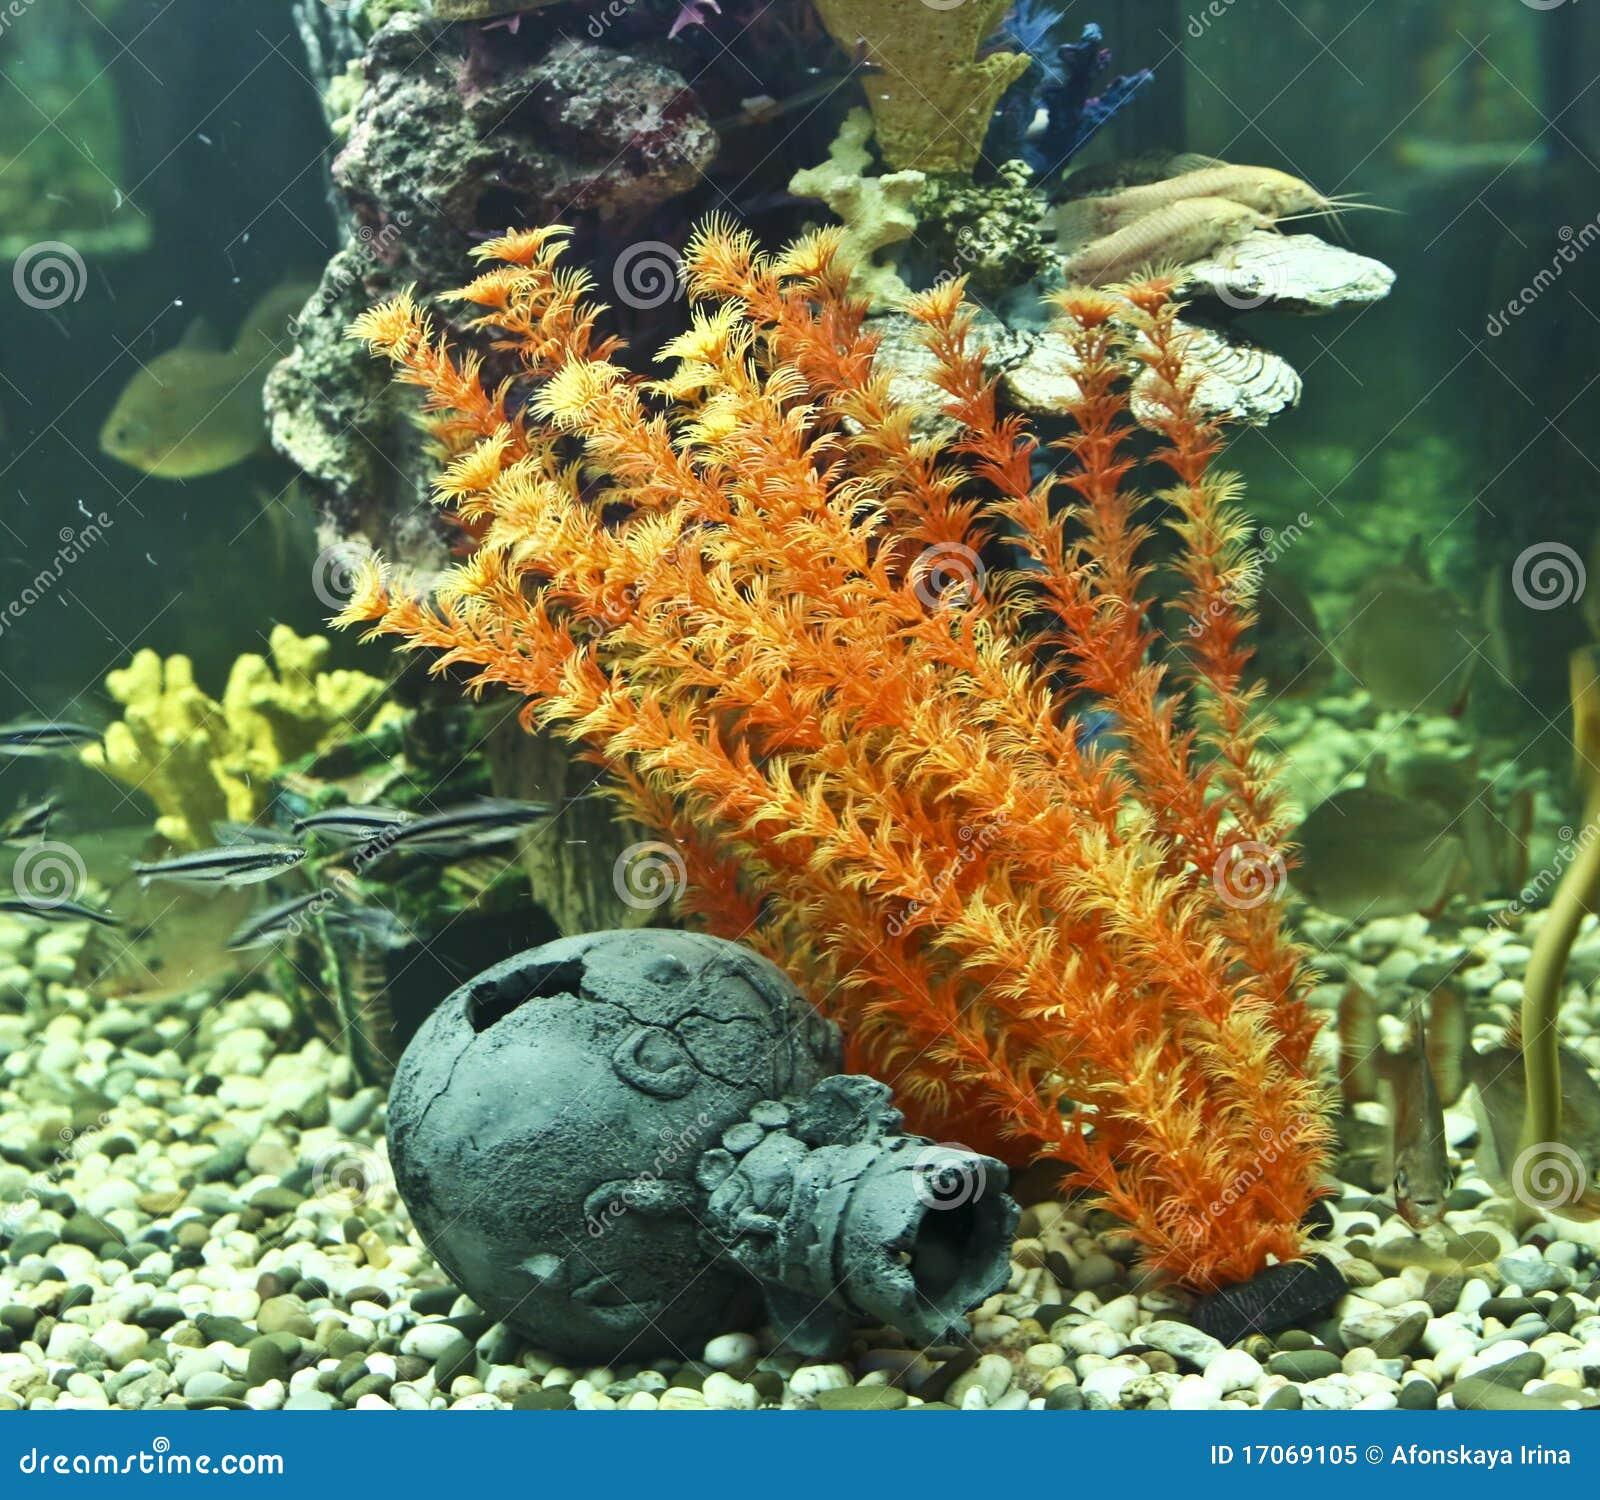 Coraux, algues et cruche, aquarium